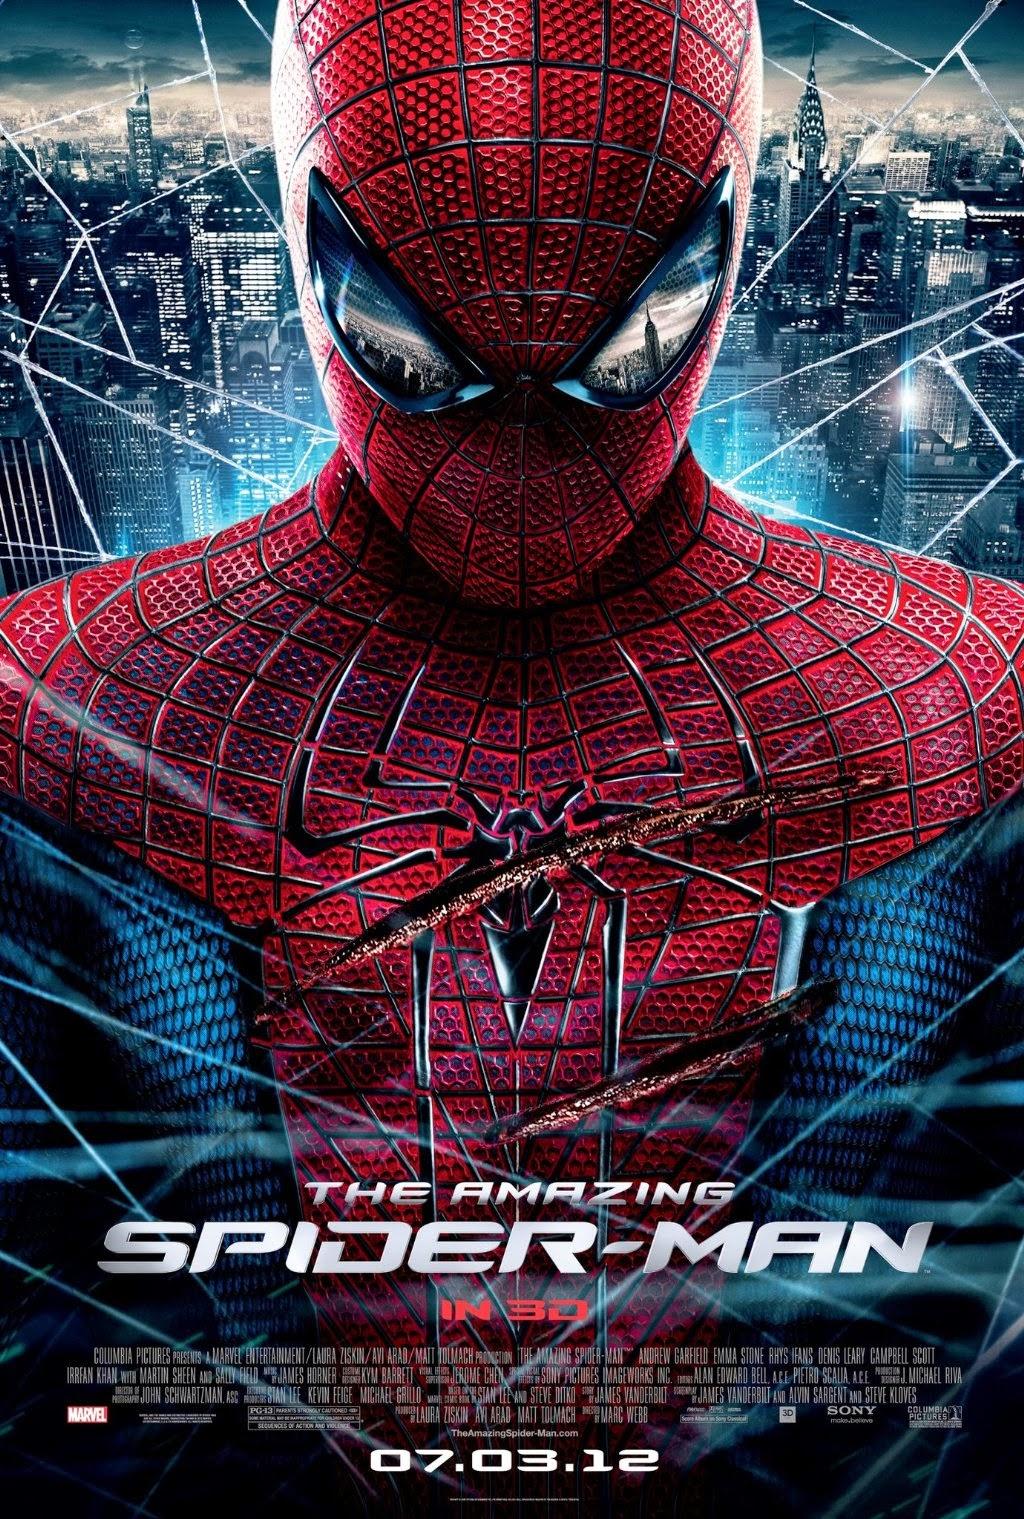 The Amazing Spider Man 1 ดิ อะเมซิ่ง สไปเดอร์แมน [HD][พากย์ไทย]